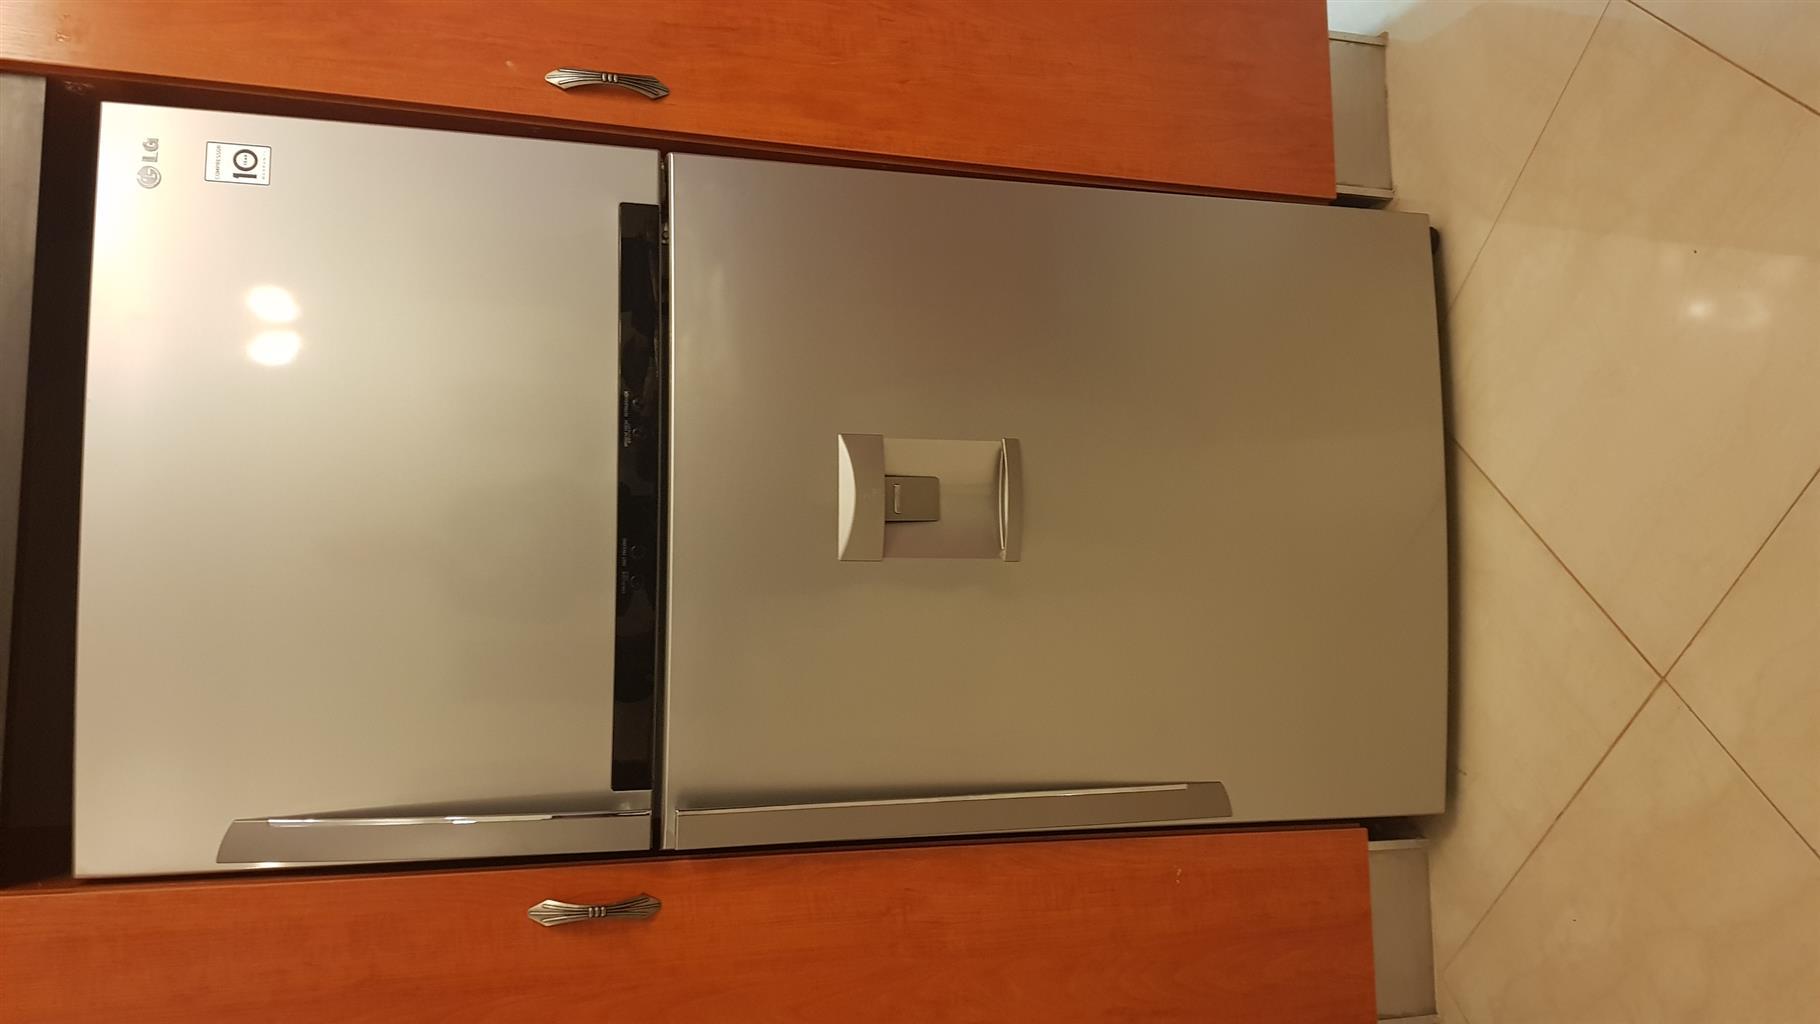 600L LG top freezer and fridge